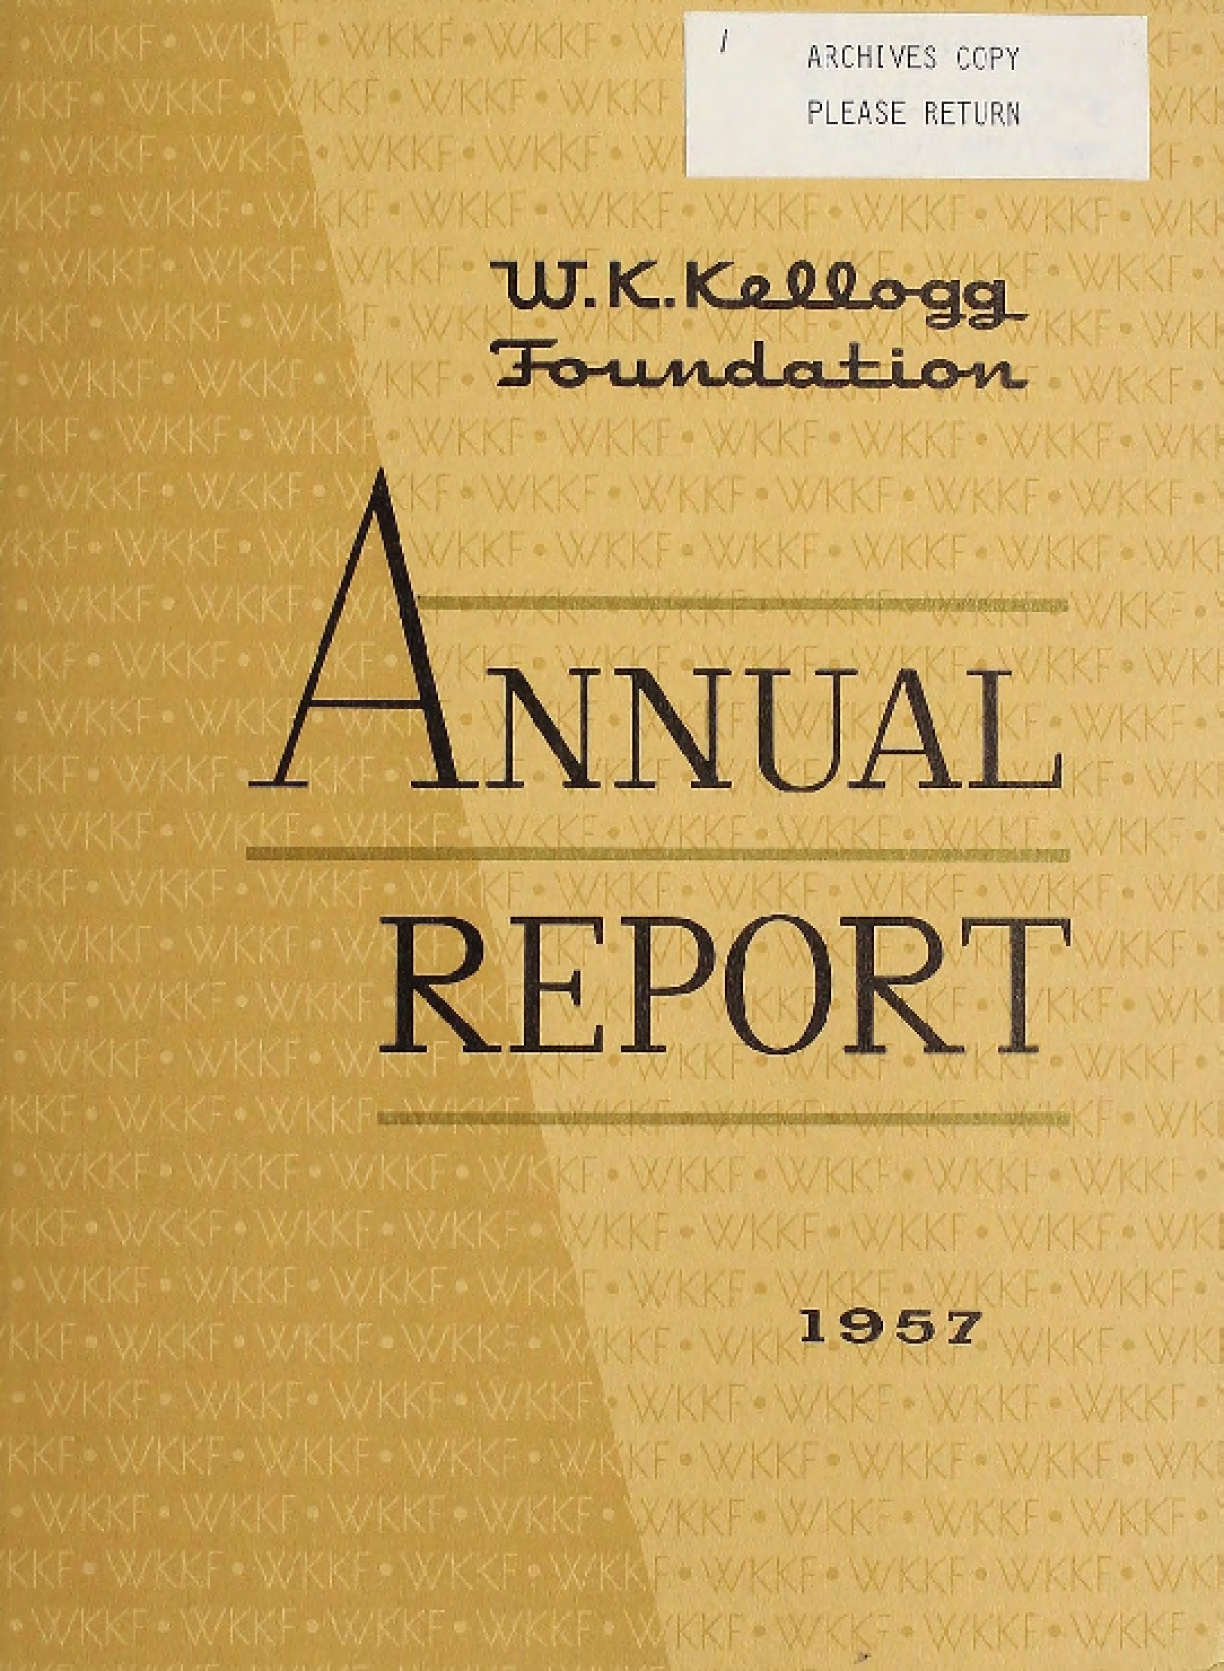 1957 W.K. Kellogg Foundation Annual Report